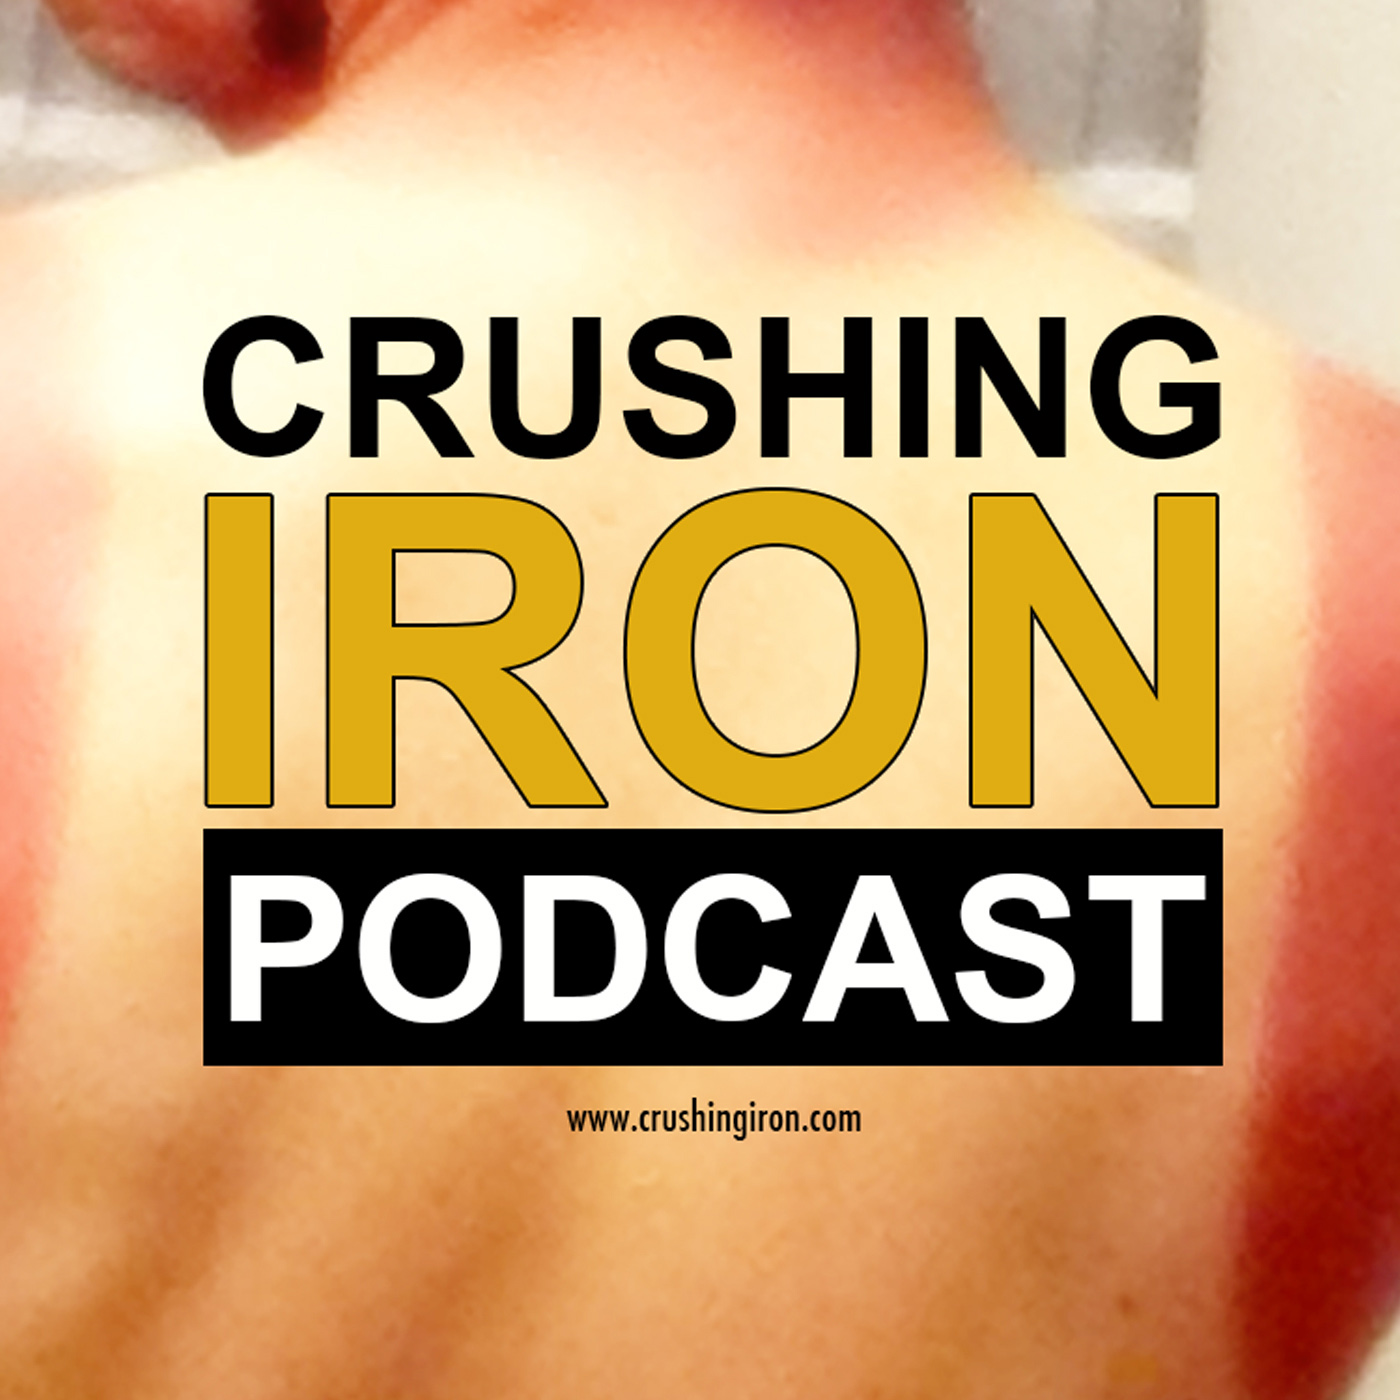 Crushing Iron Triathlon Podcast show art